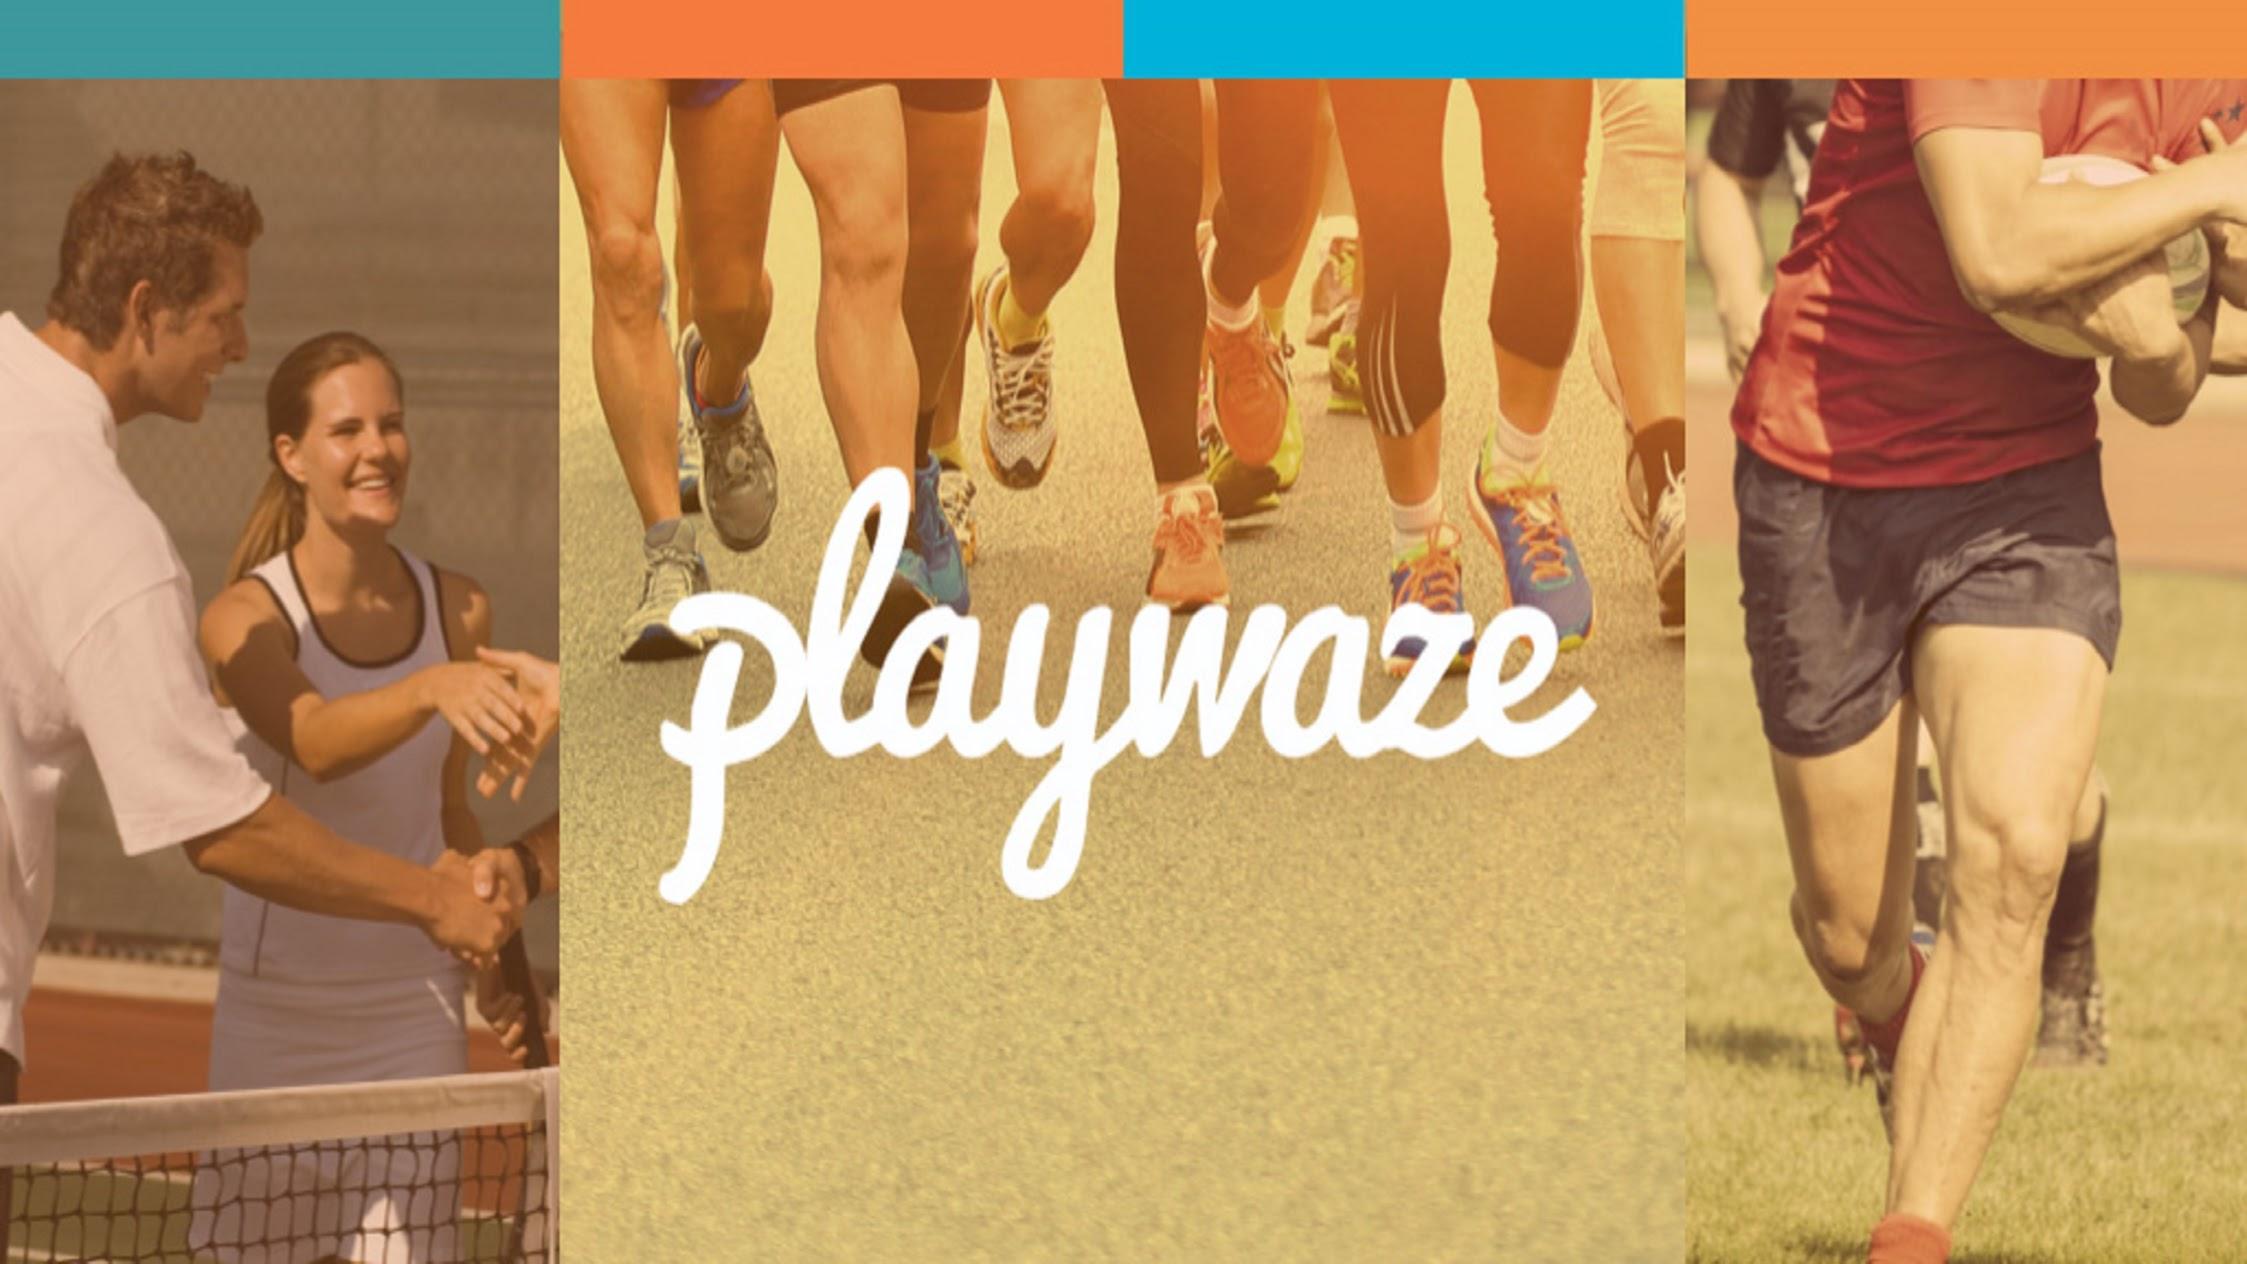 Playwaze Ltd